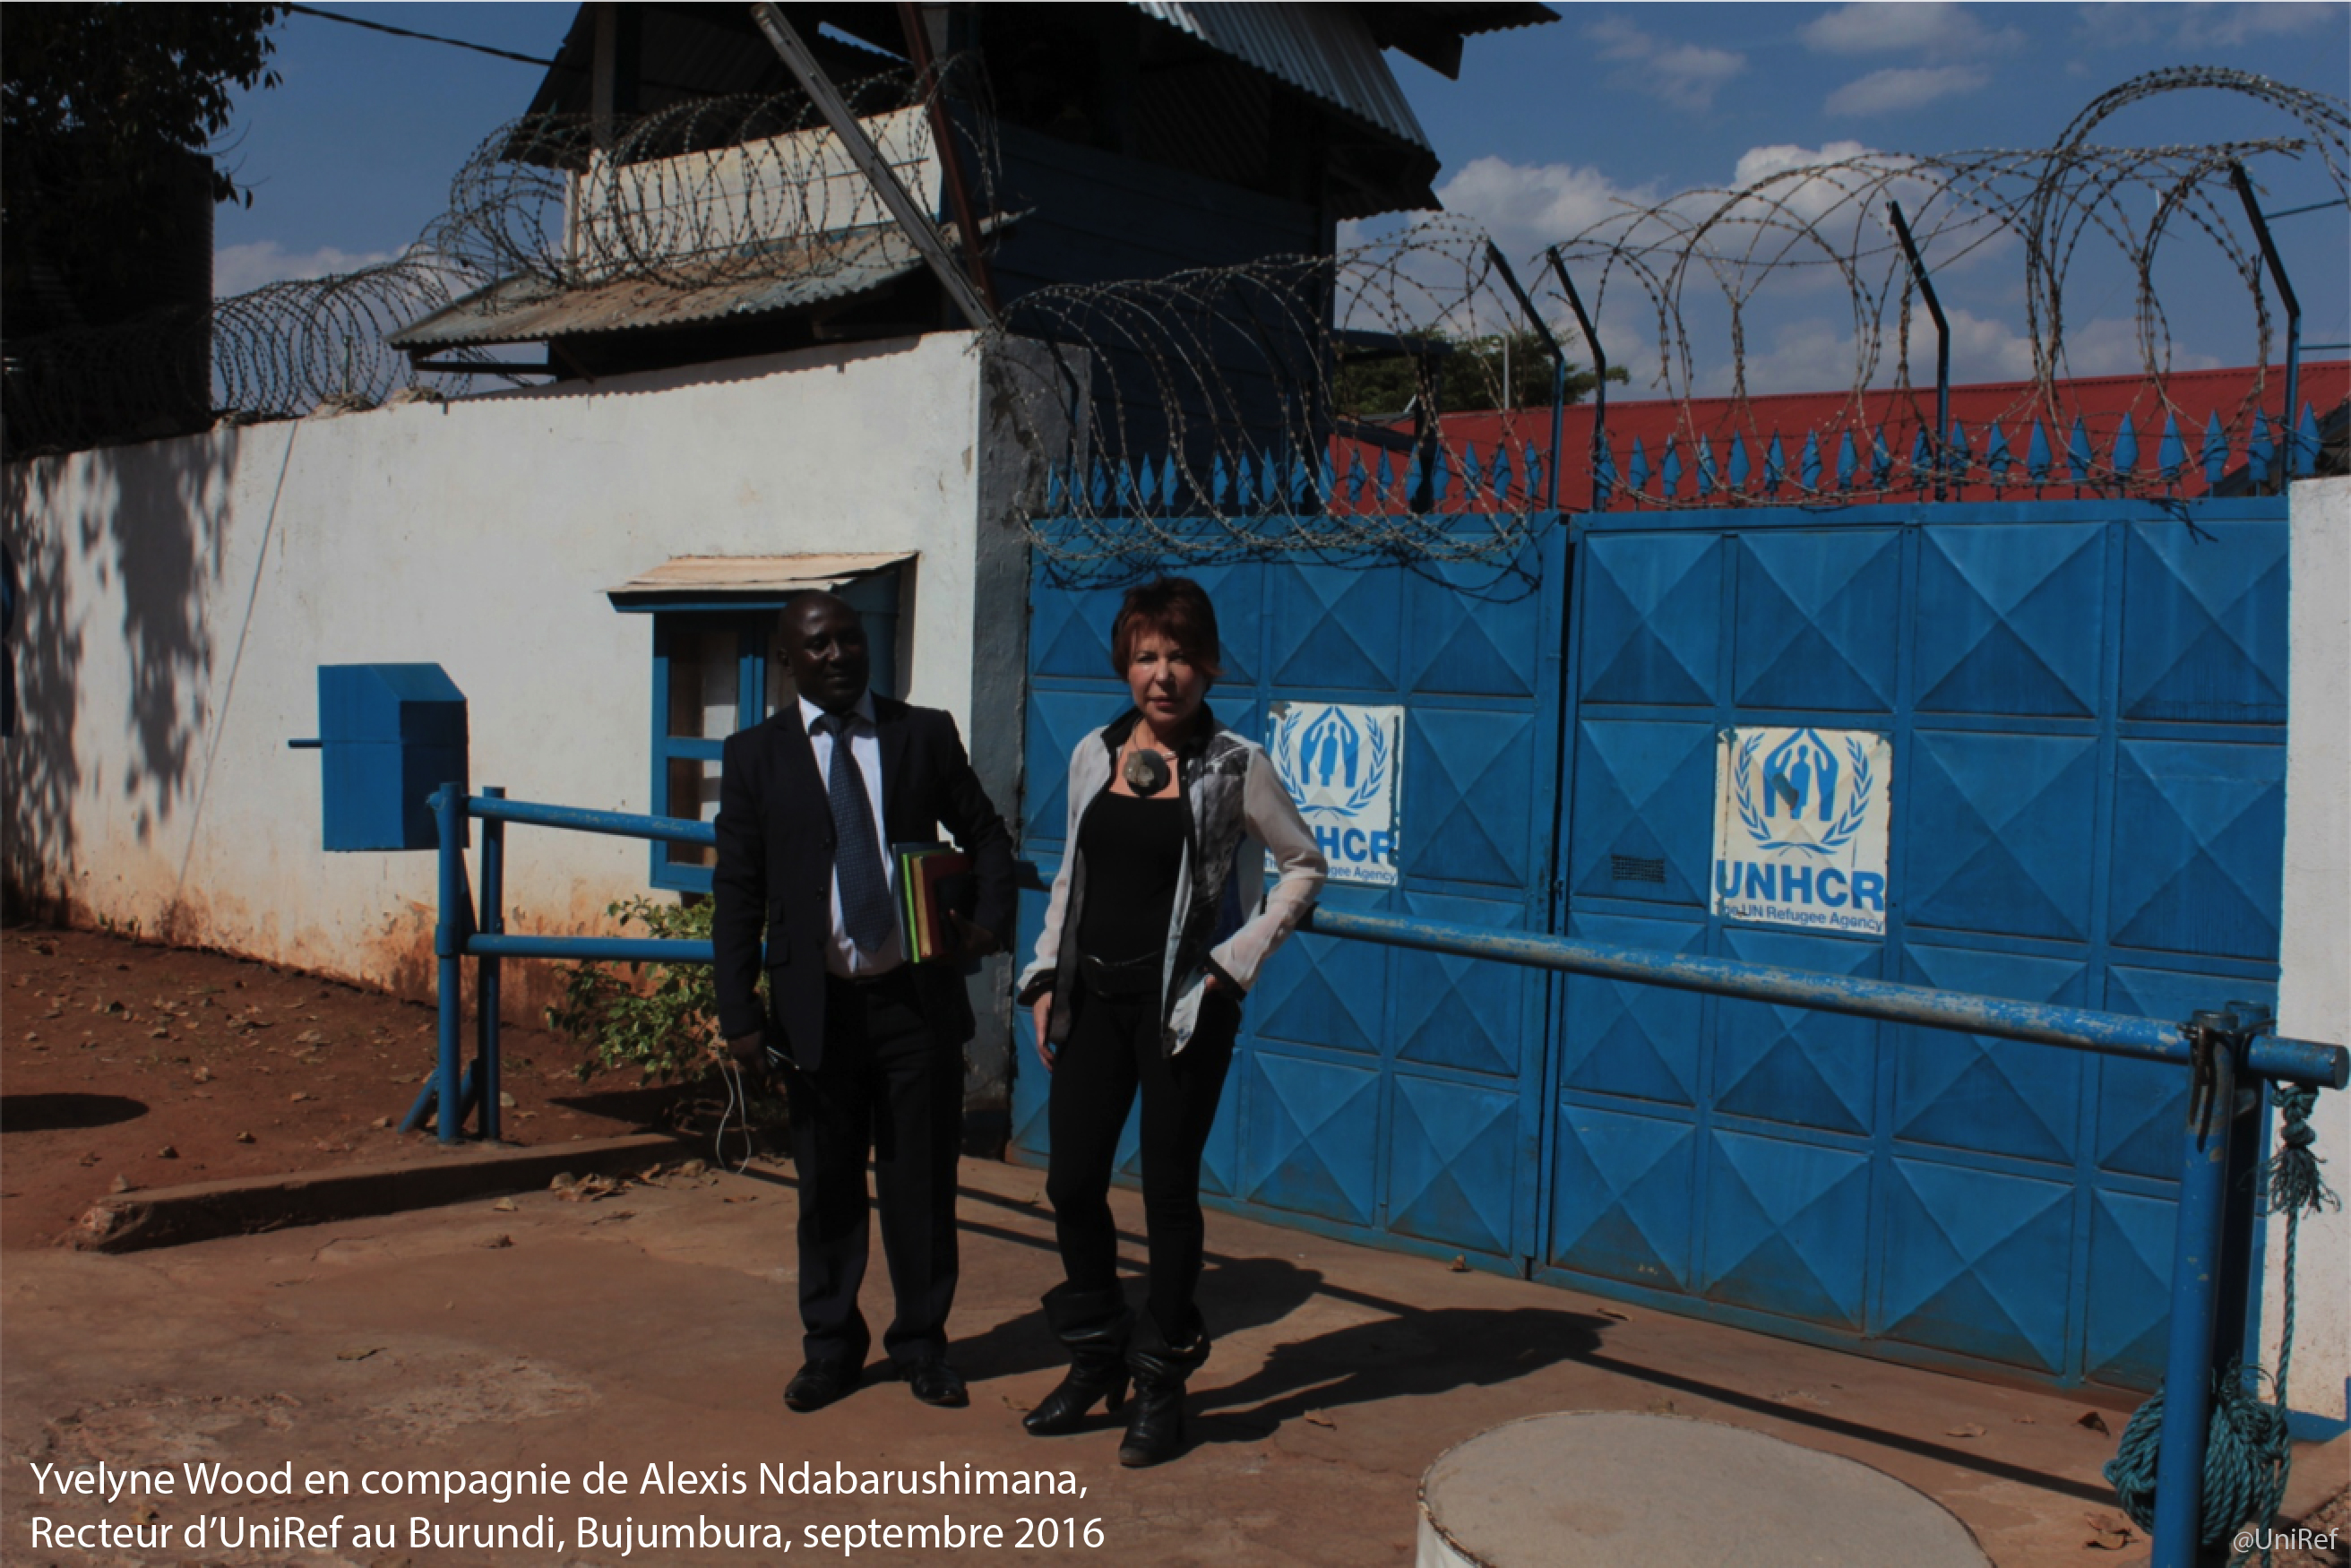 Yvelyne Wood en compagnie de Alexis Ndabarushimana, Recteur d'Uniref au Burundi, Bujumbura, septembre 2016